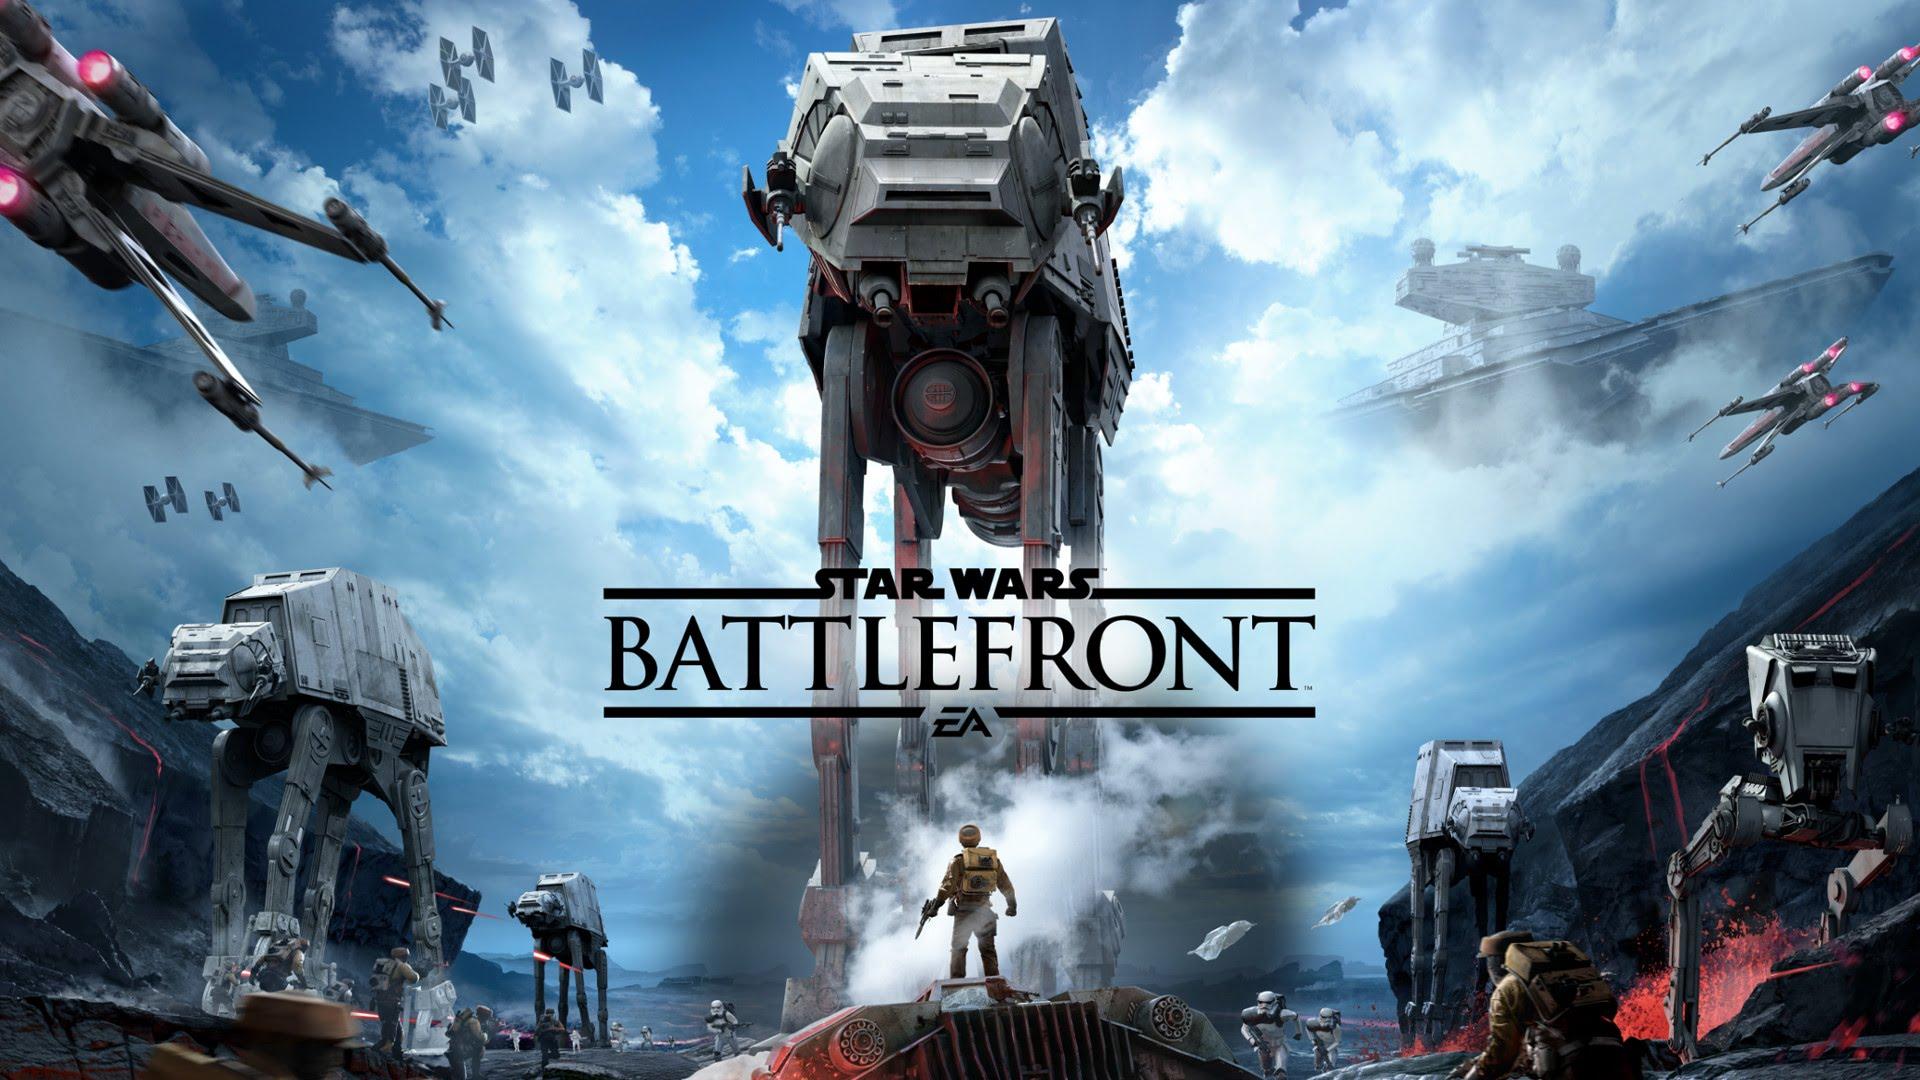 star wars battlefront video game wallpaper 48666